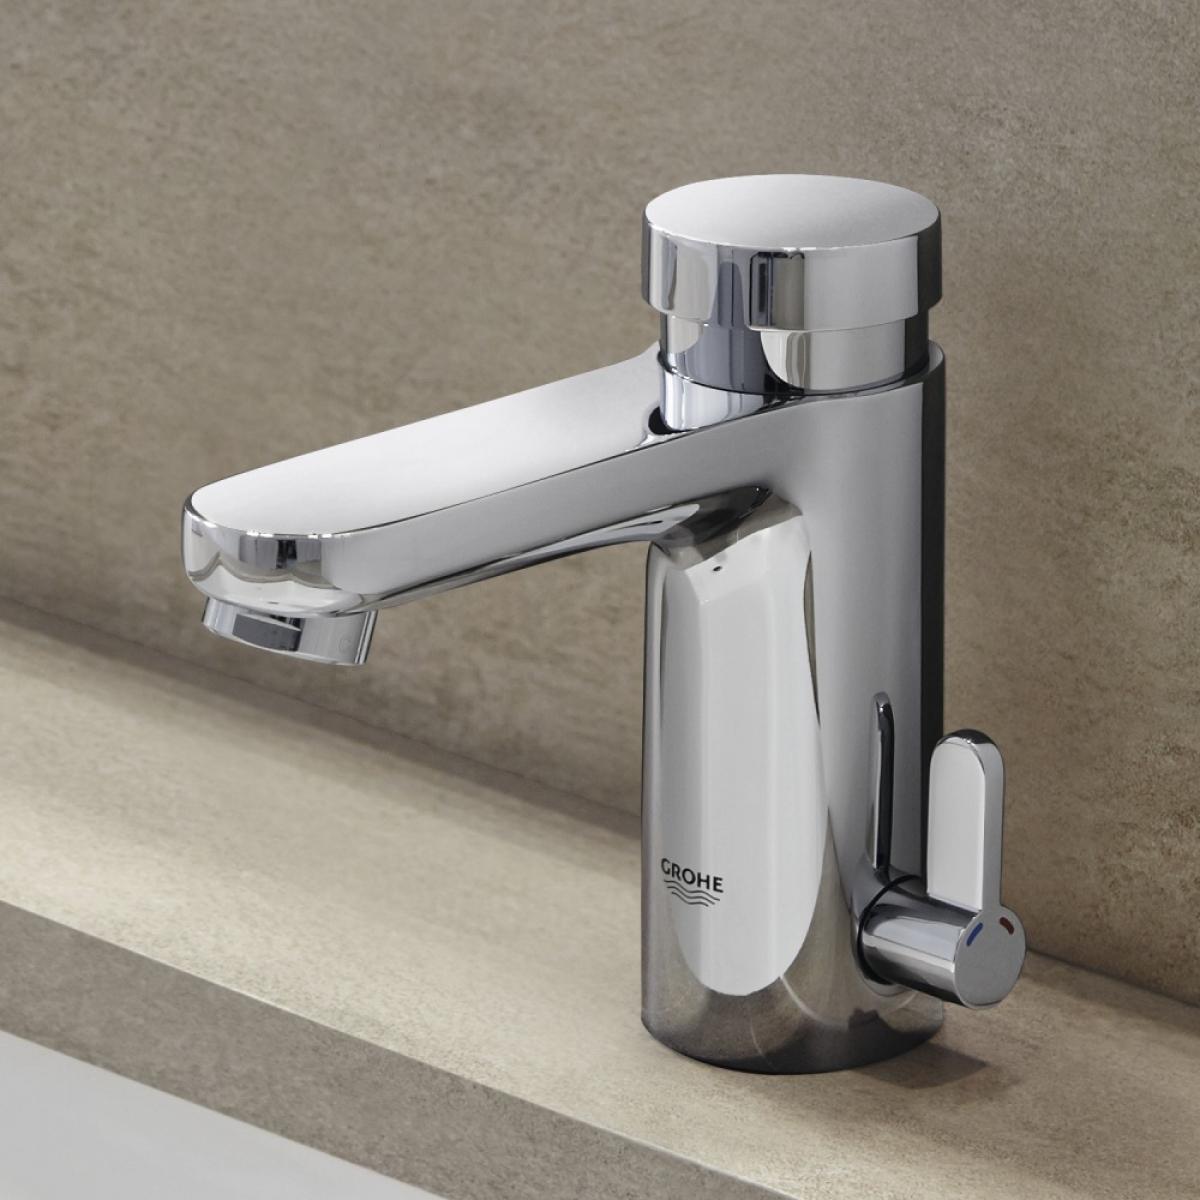 Robinet fermeture temporis e eurosmart cosmopolitan e for Prix robinet grohe salle de bain